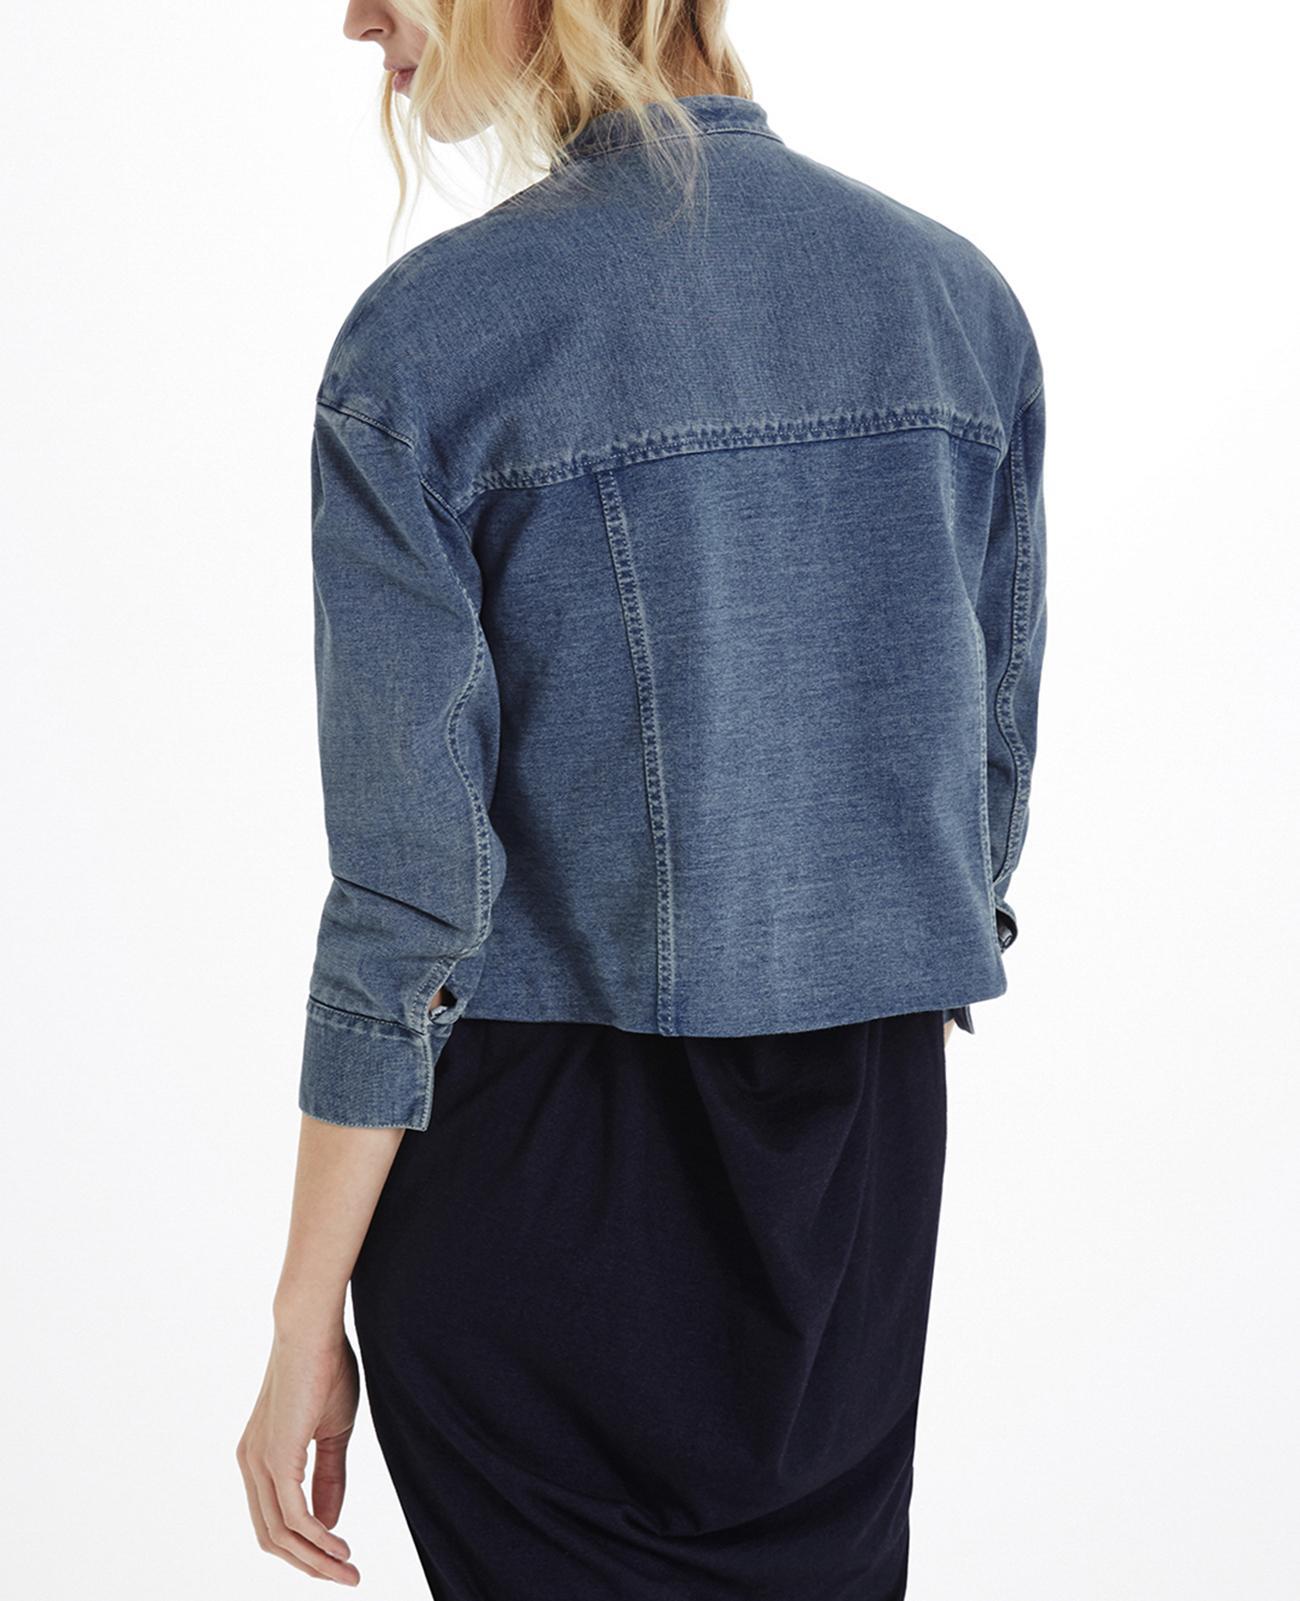 The Obolo Jacket